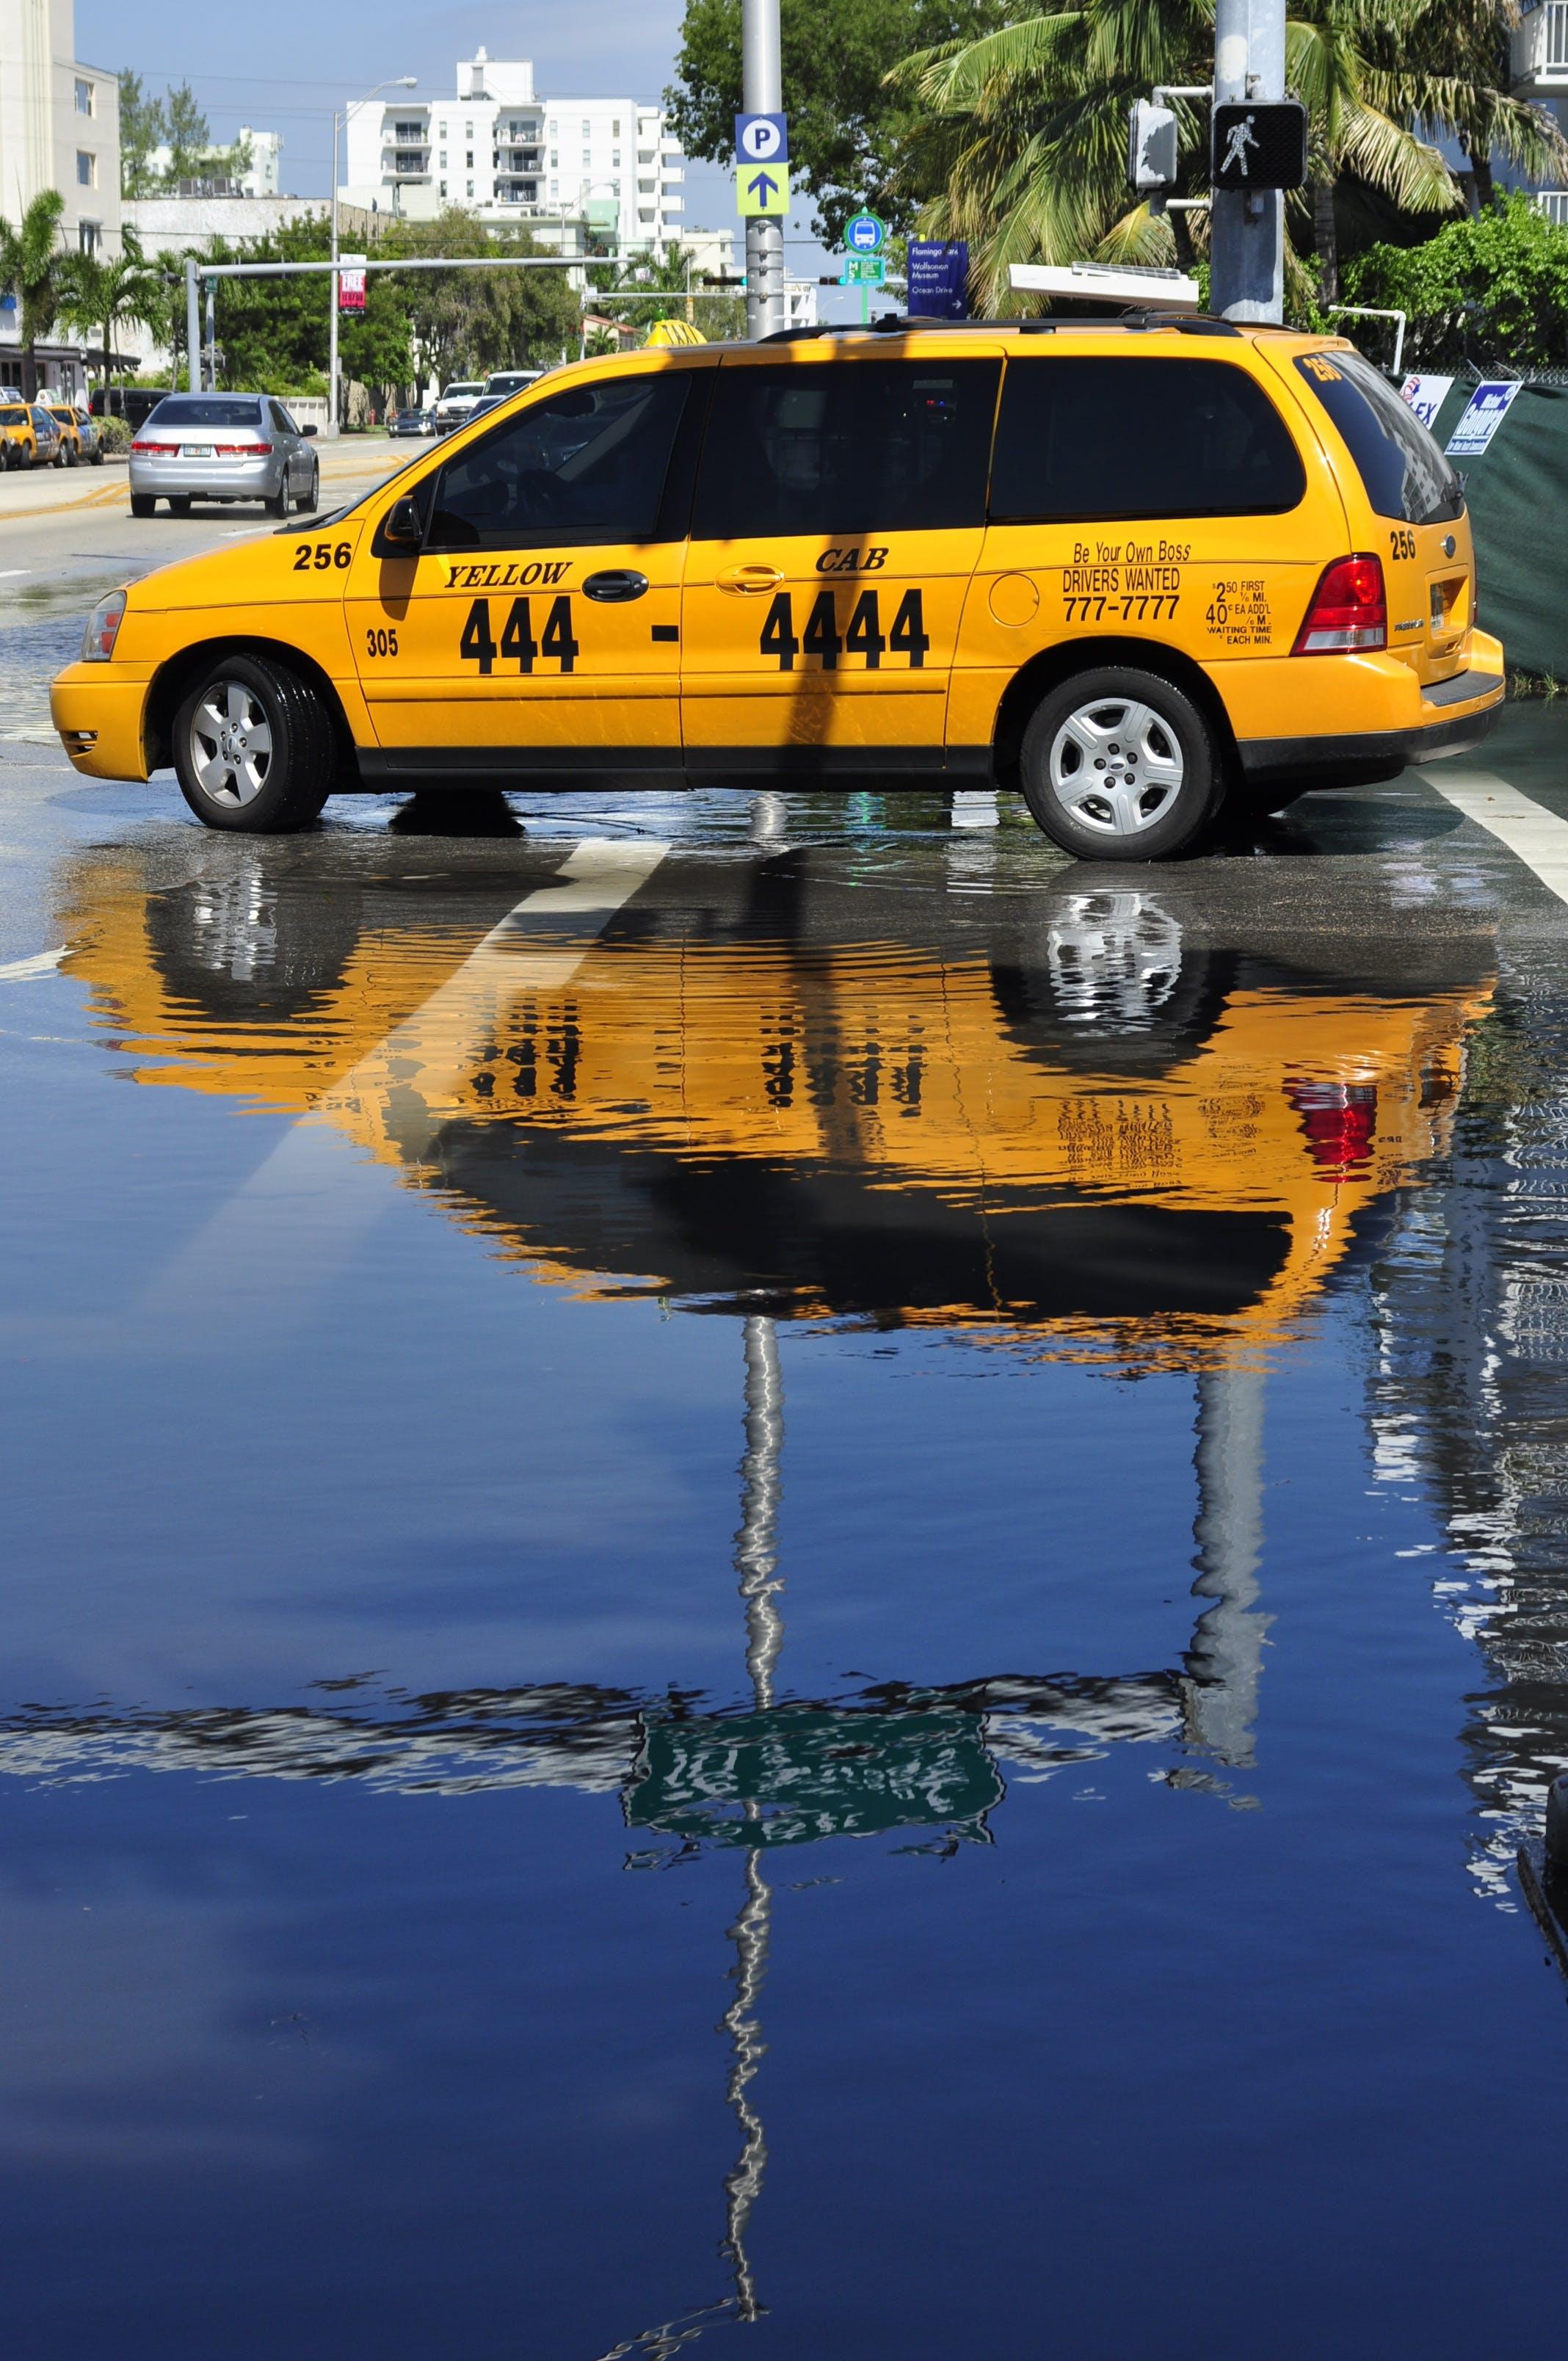 Free stock photo of cab, miami, reflection, street